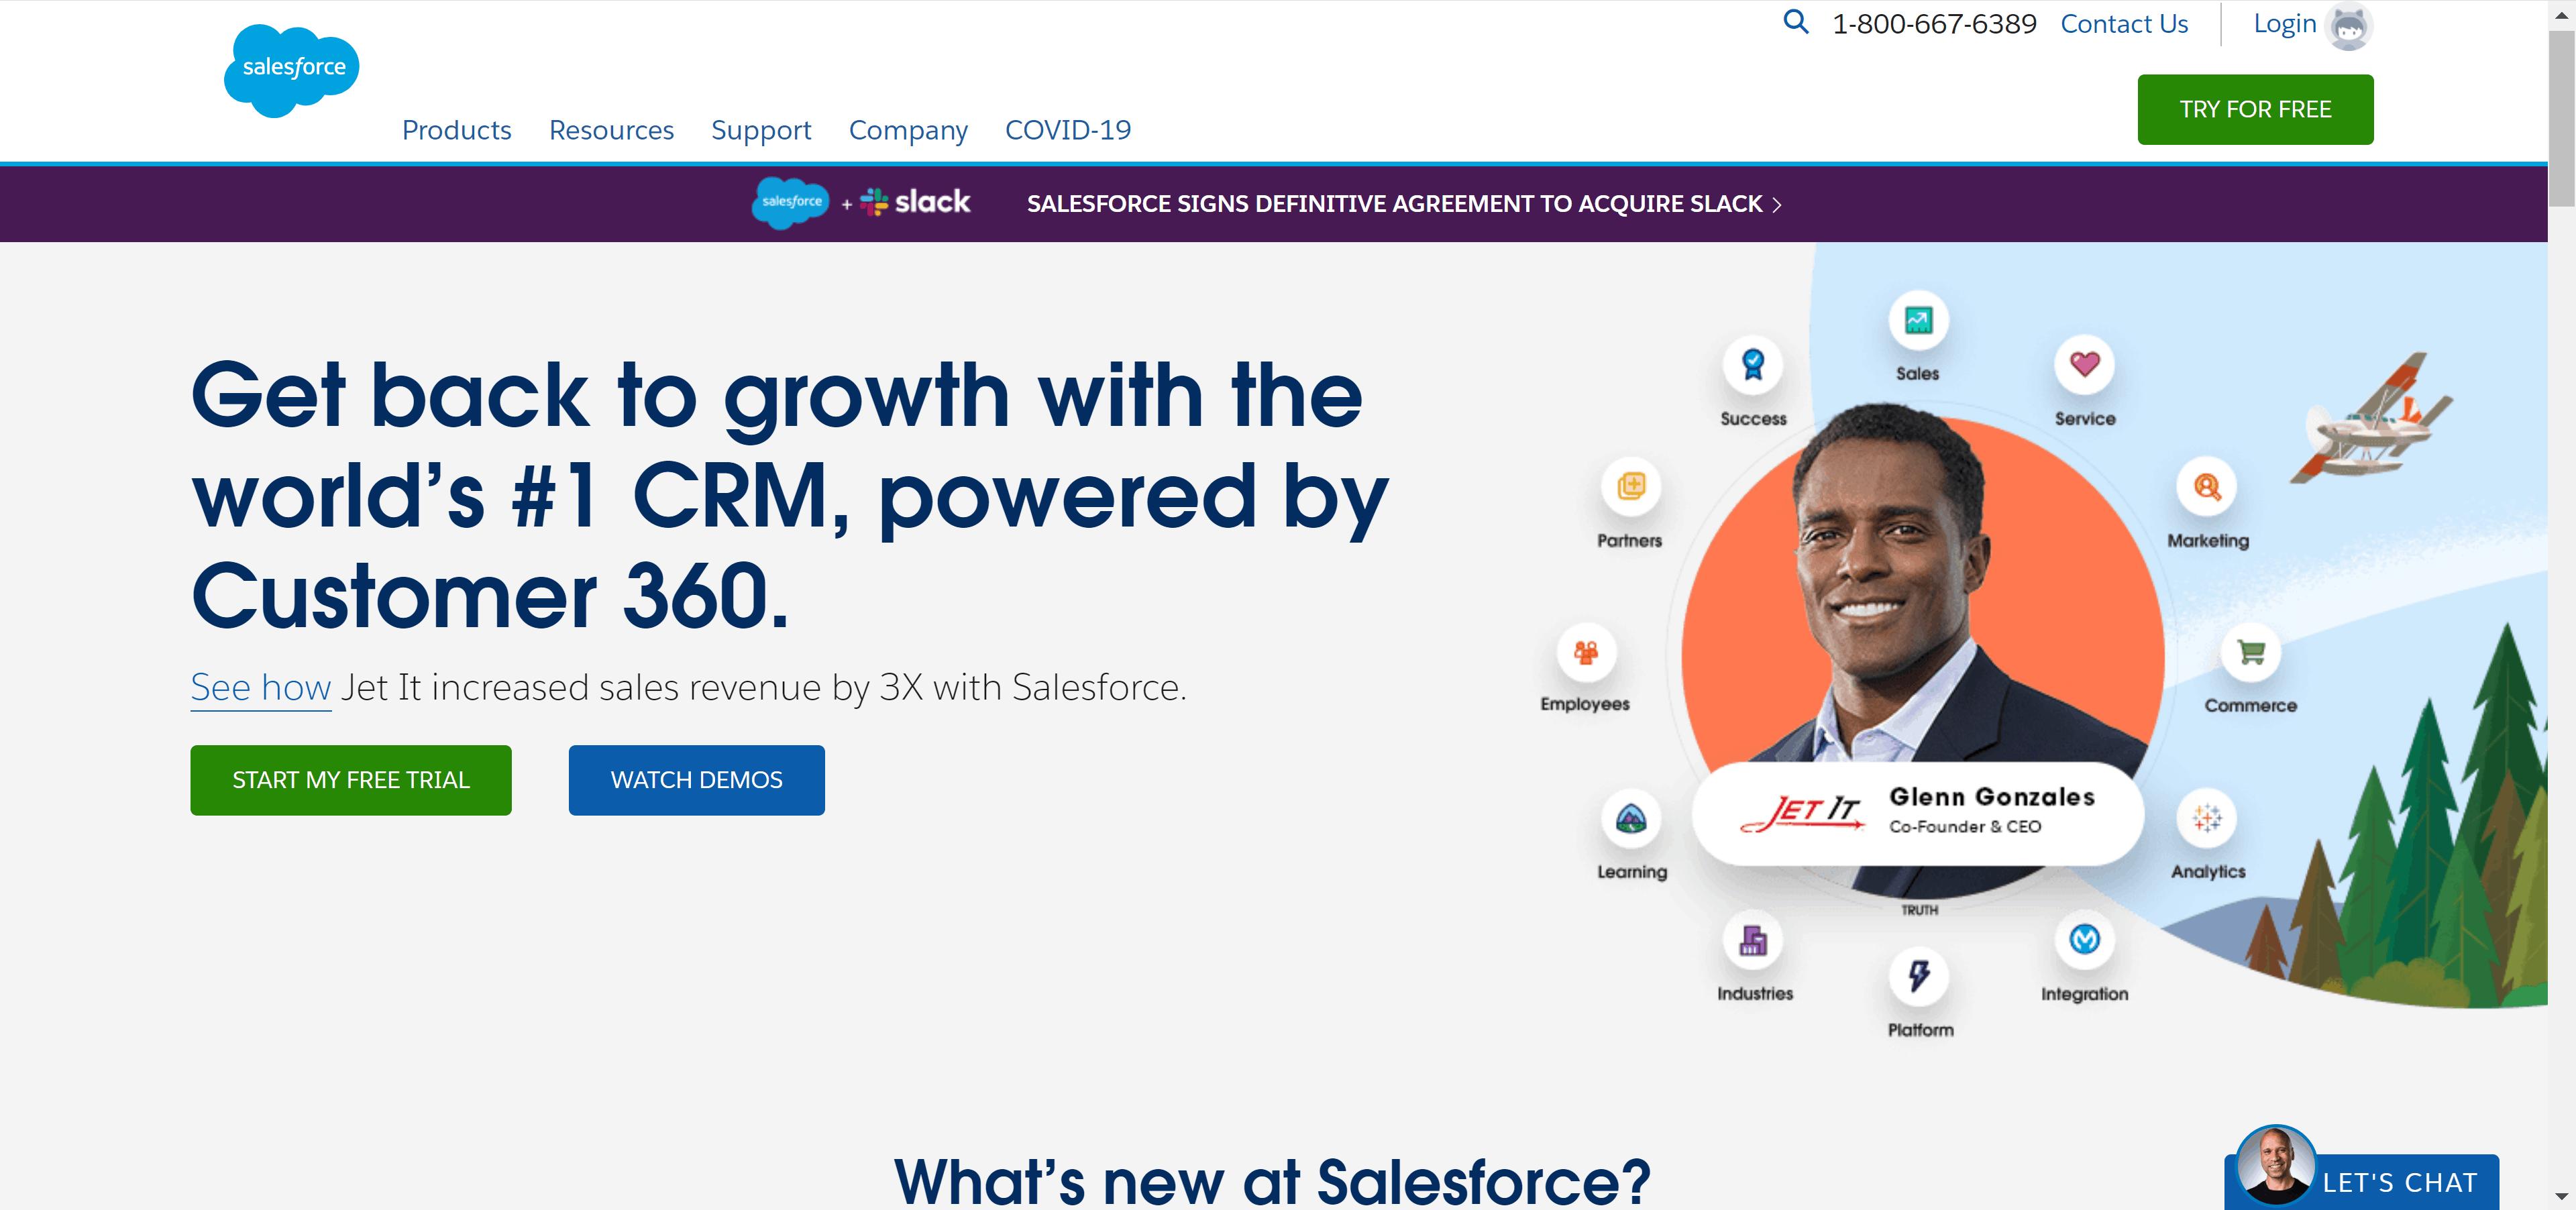 Salesforce CRM Tool